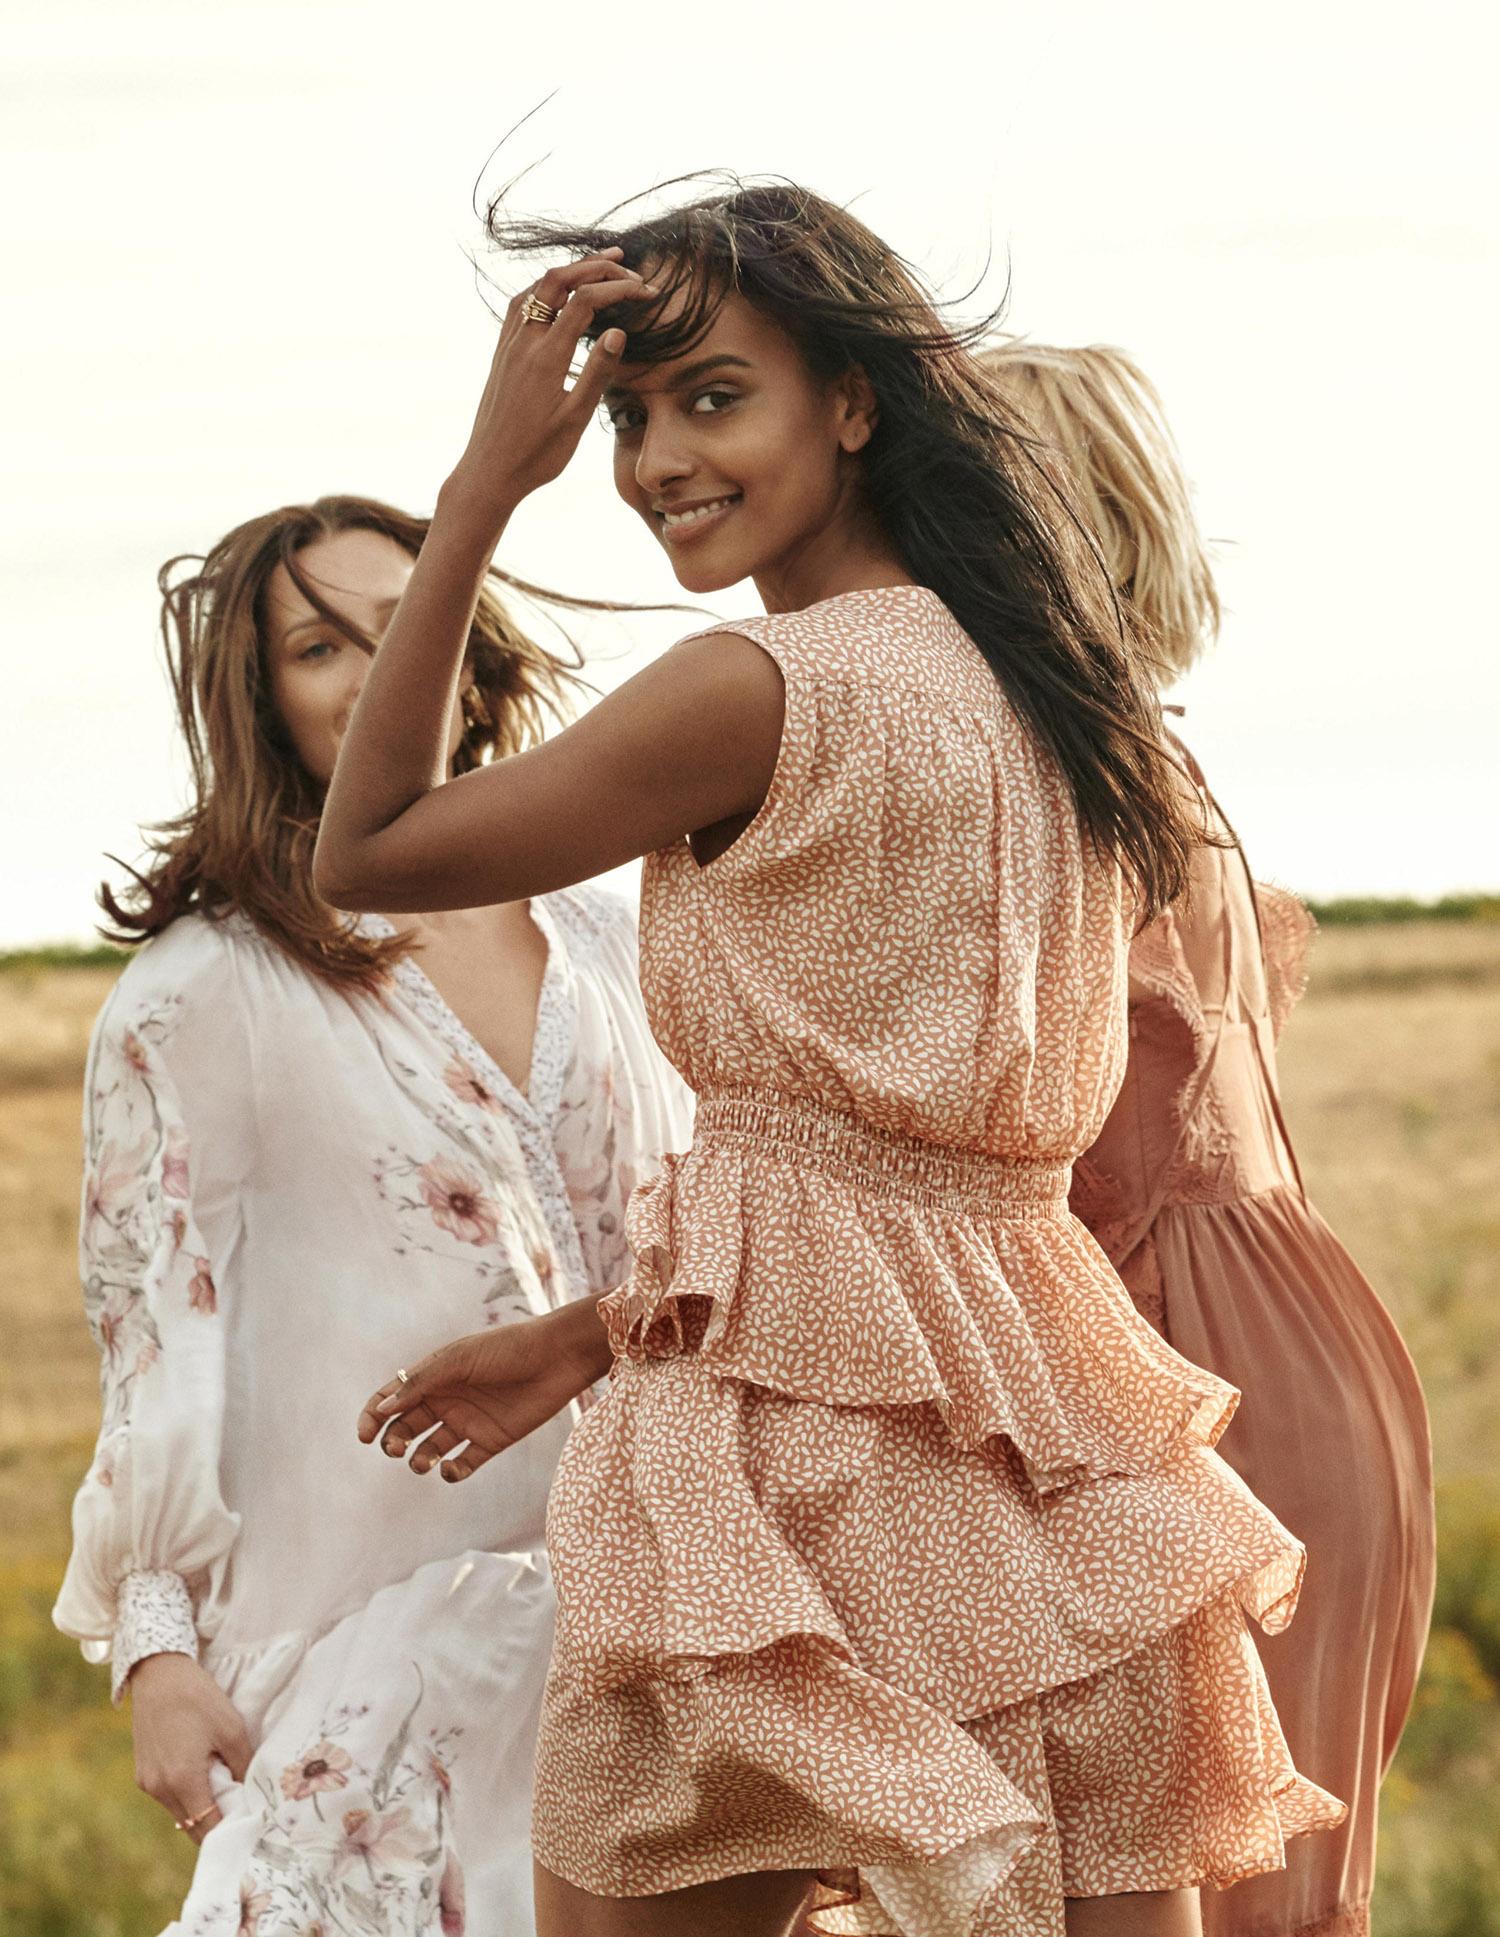 H&M CONSCIOUS SS19 moda, On top Macarena Gea